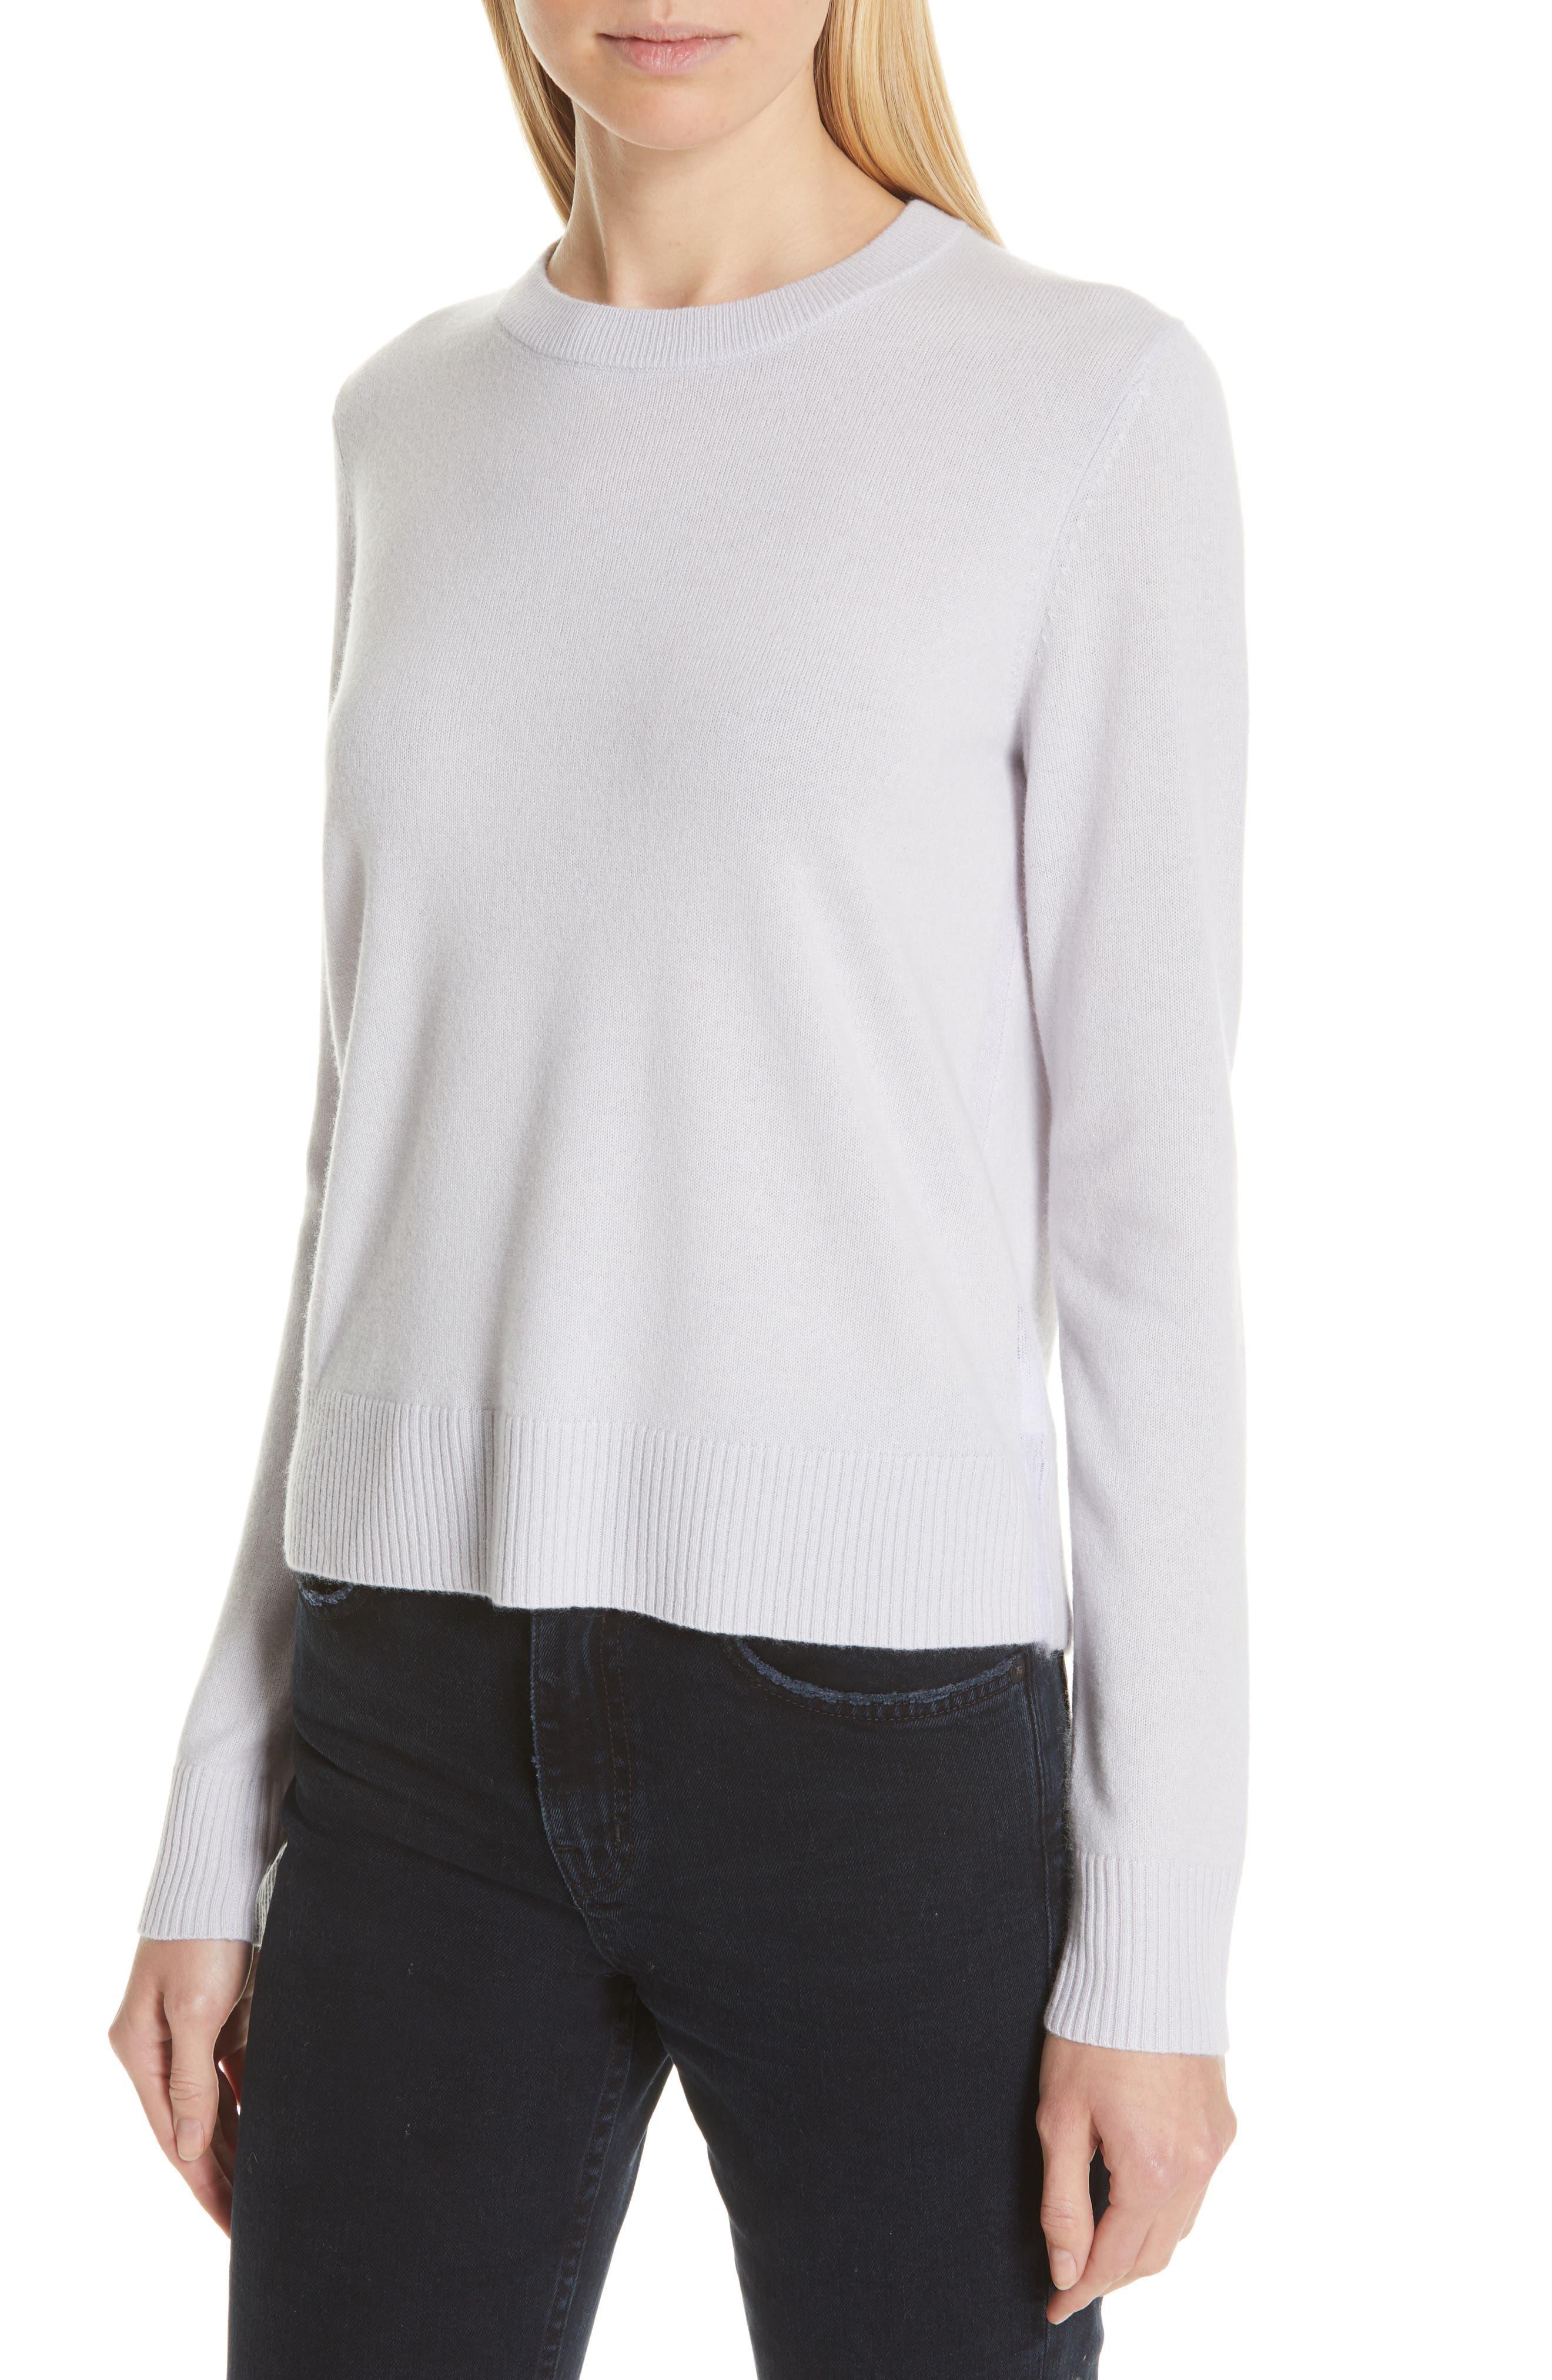 PROENZA SCHOULER, Cashmere Sweater, Alternate thumbnail 4, color, BLUE GREY